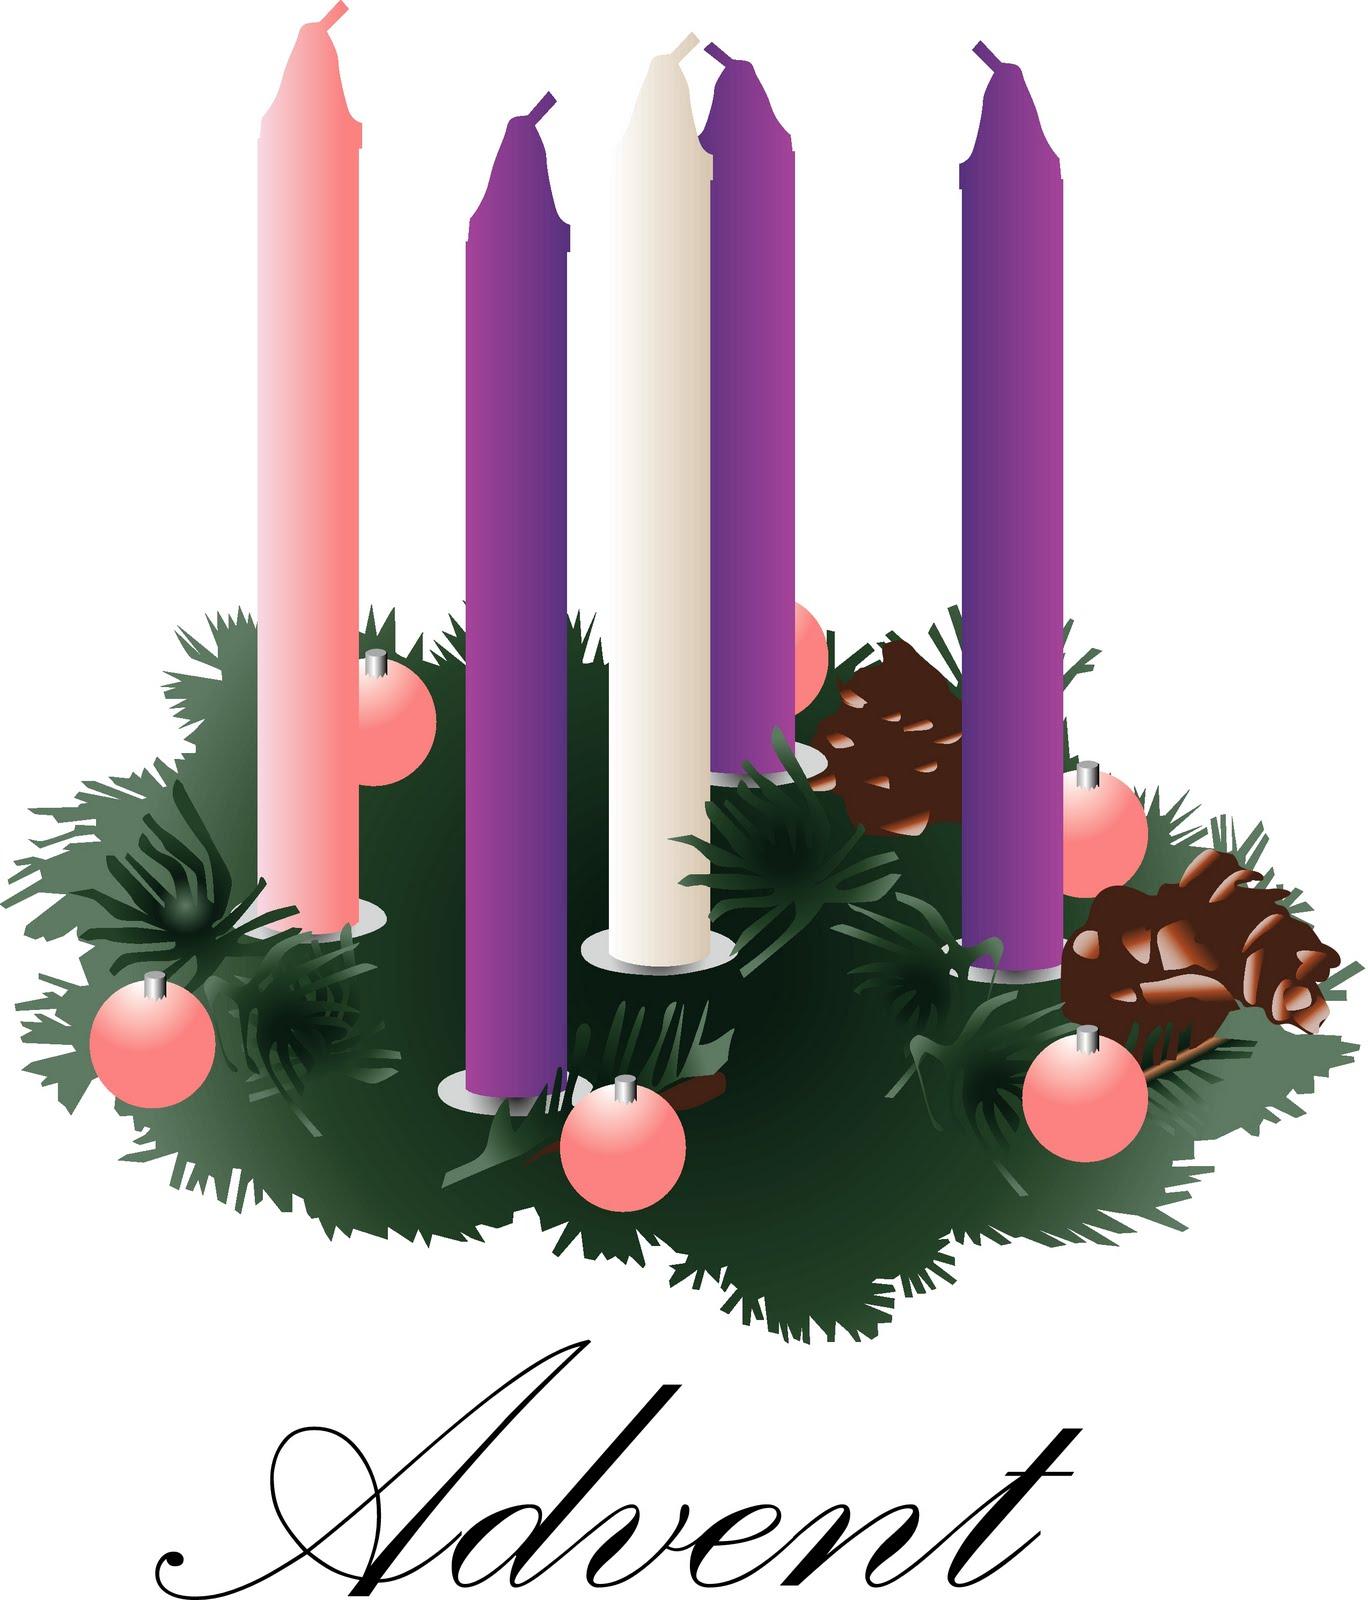 Clipart advent calendar clker image free stock Advent Candles Clipart - Clipart Kid image free stock